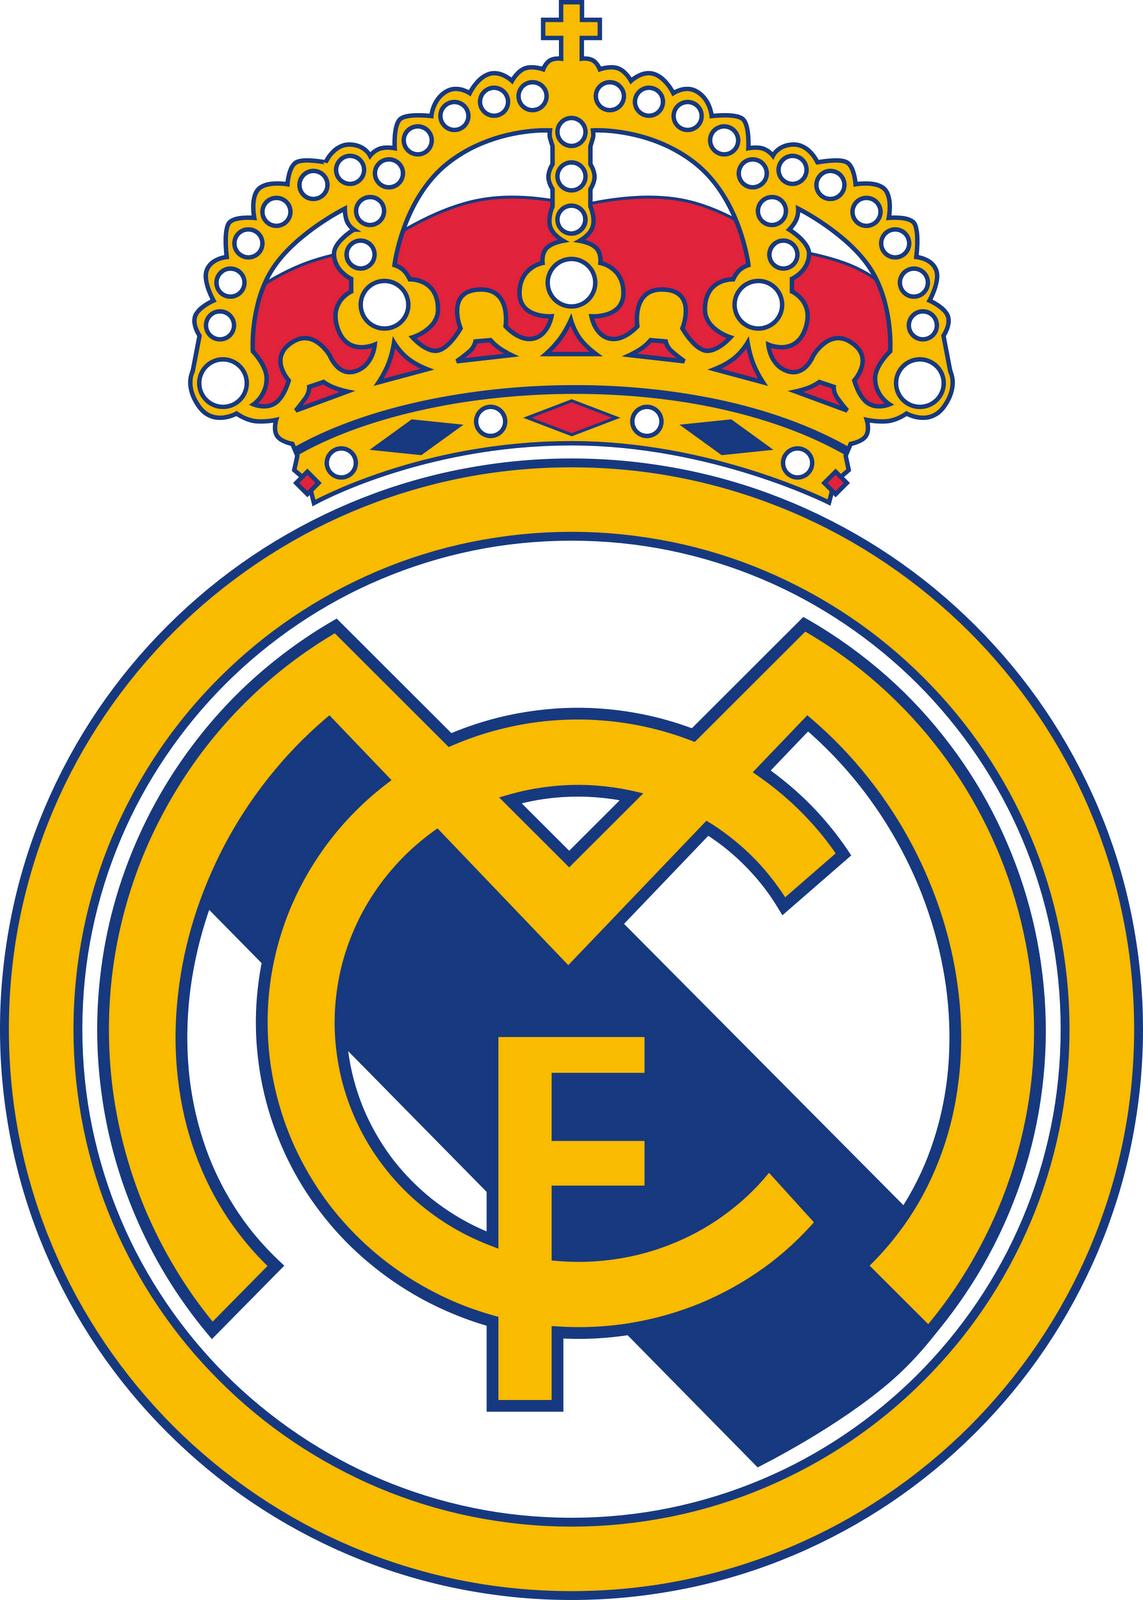 Real Madrid FC Logo ImageBankbiz 1143x1600